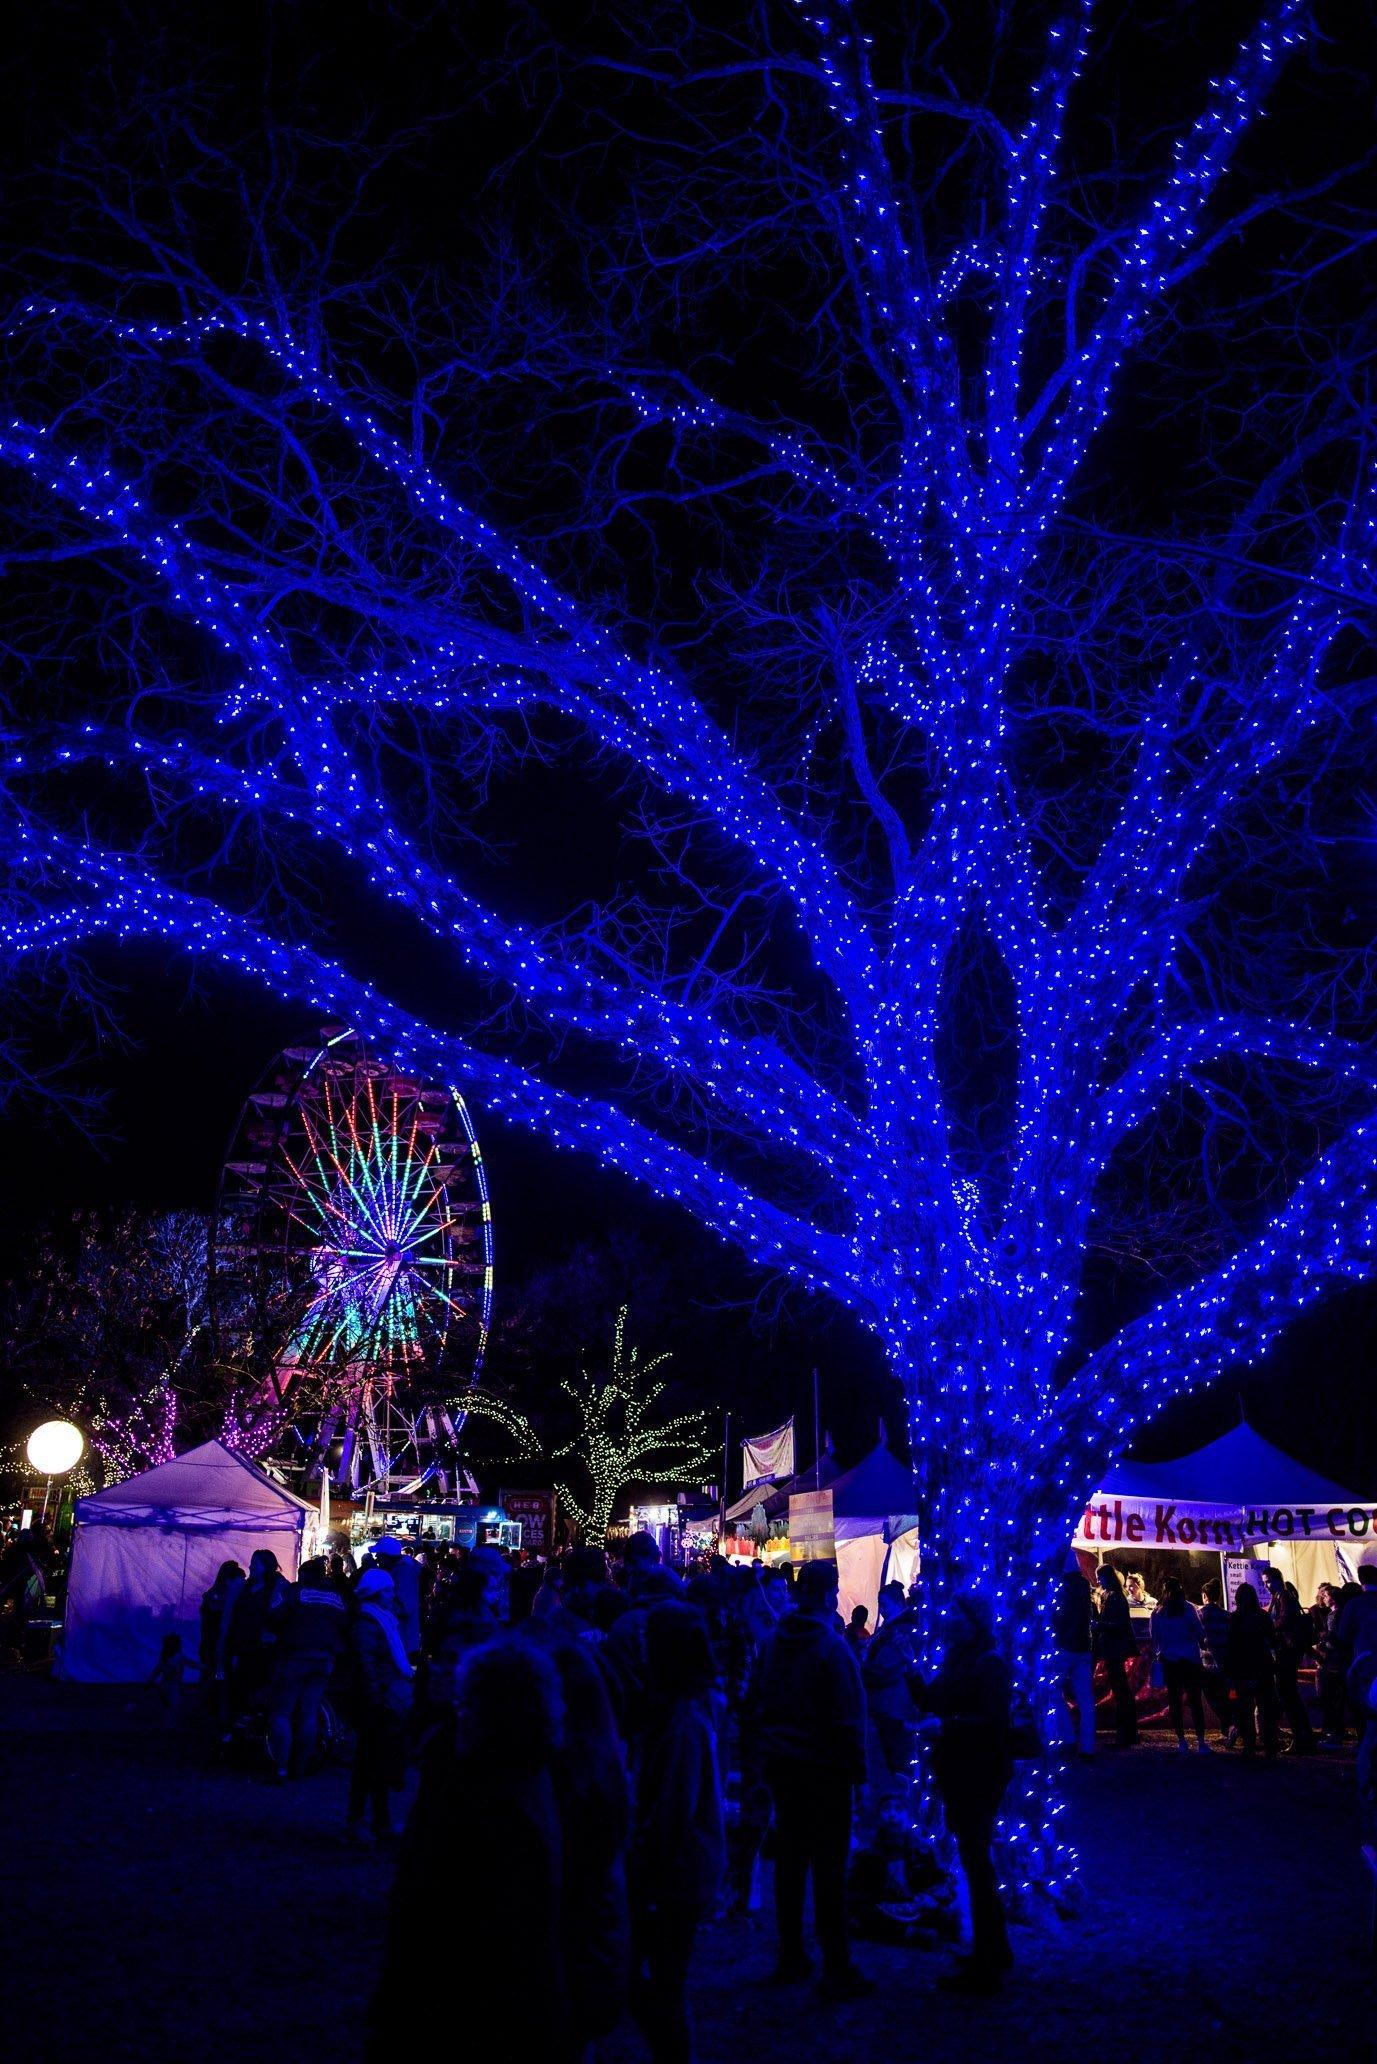 Trail of Lights, ferris wheel